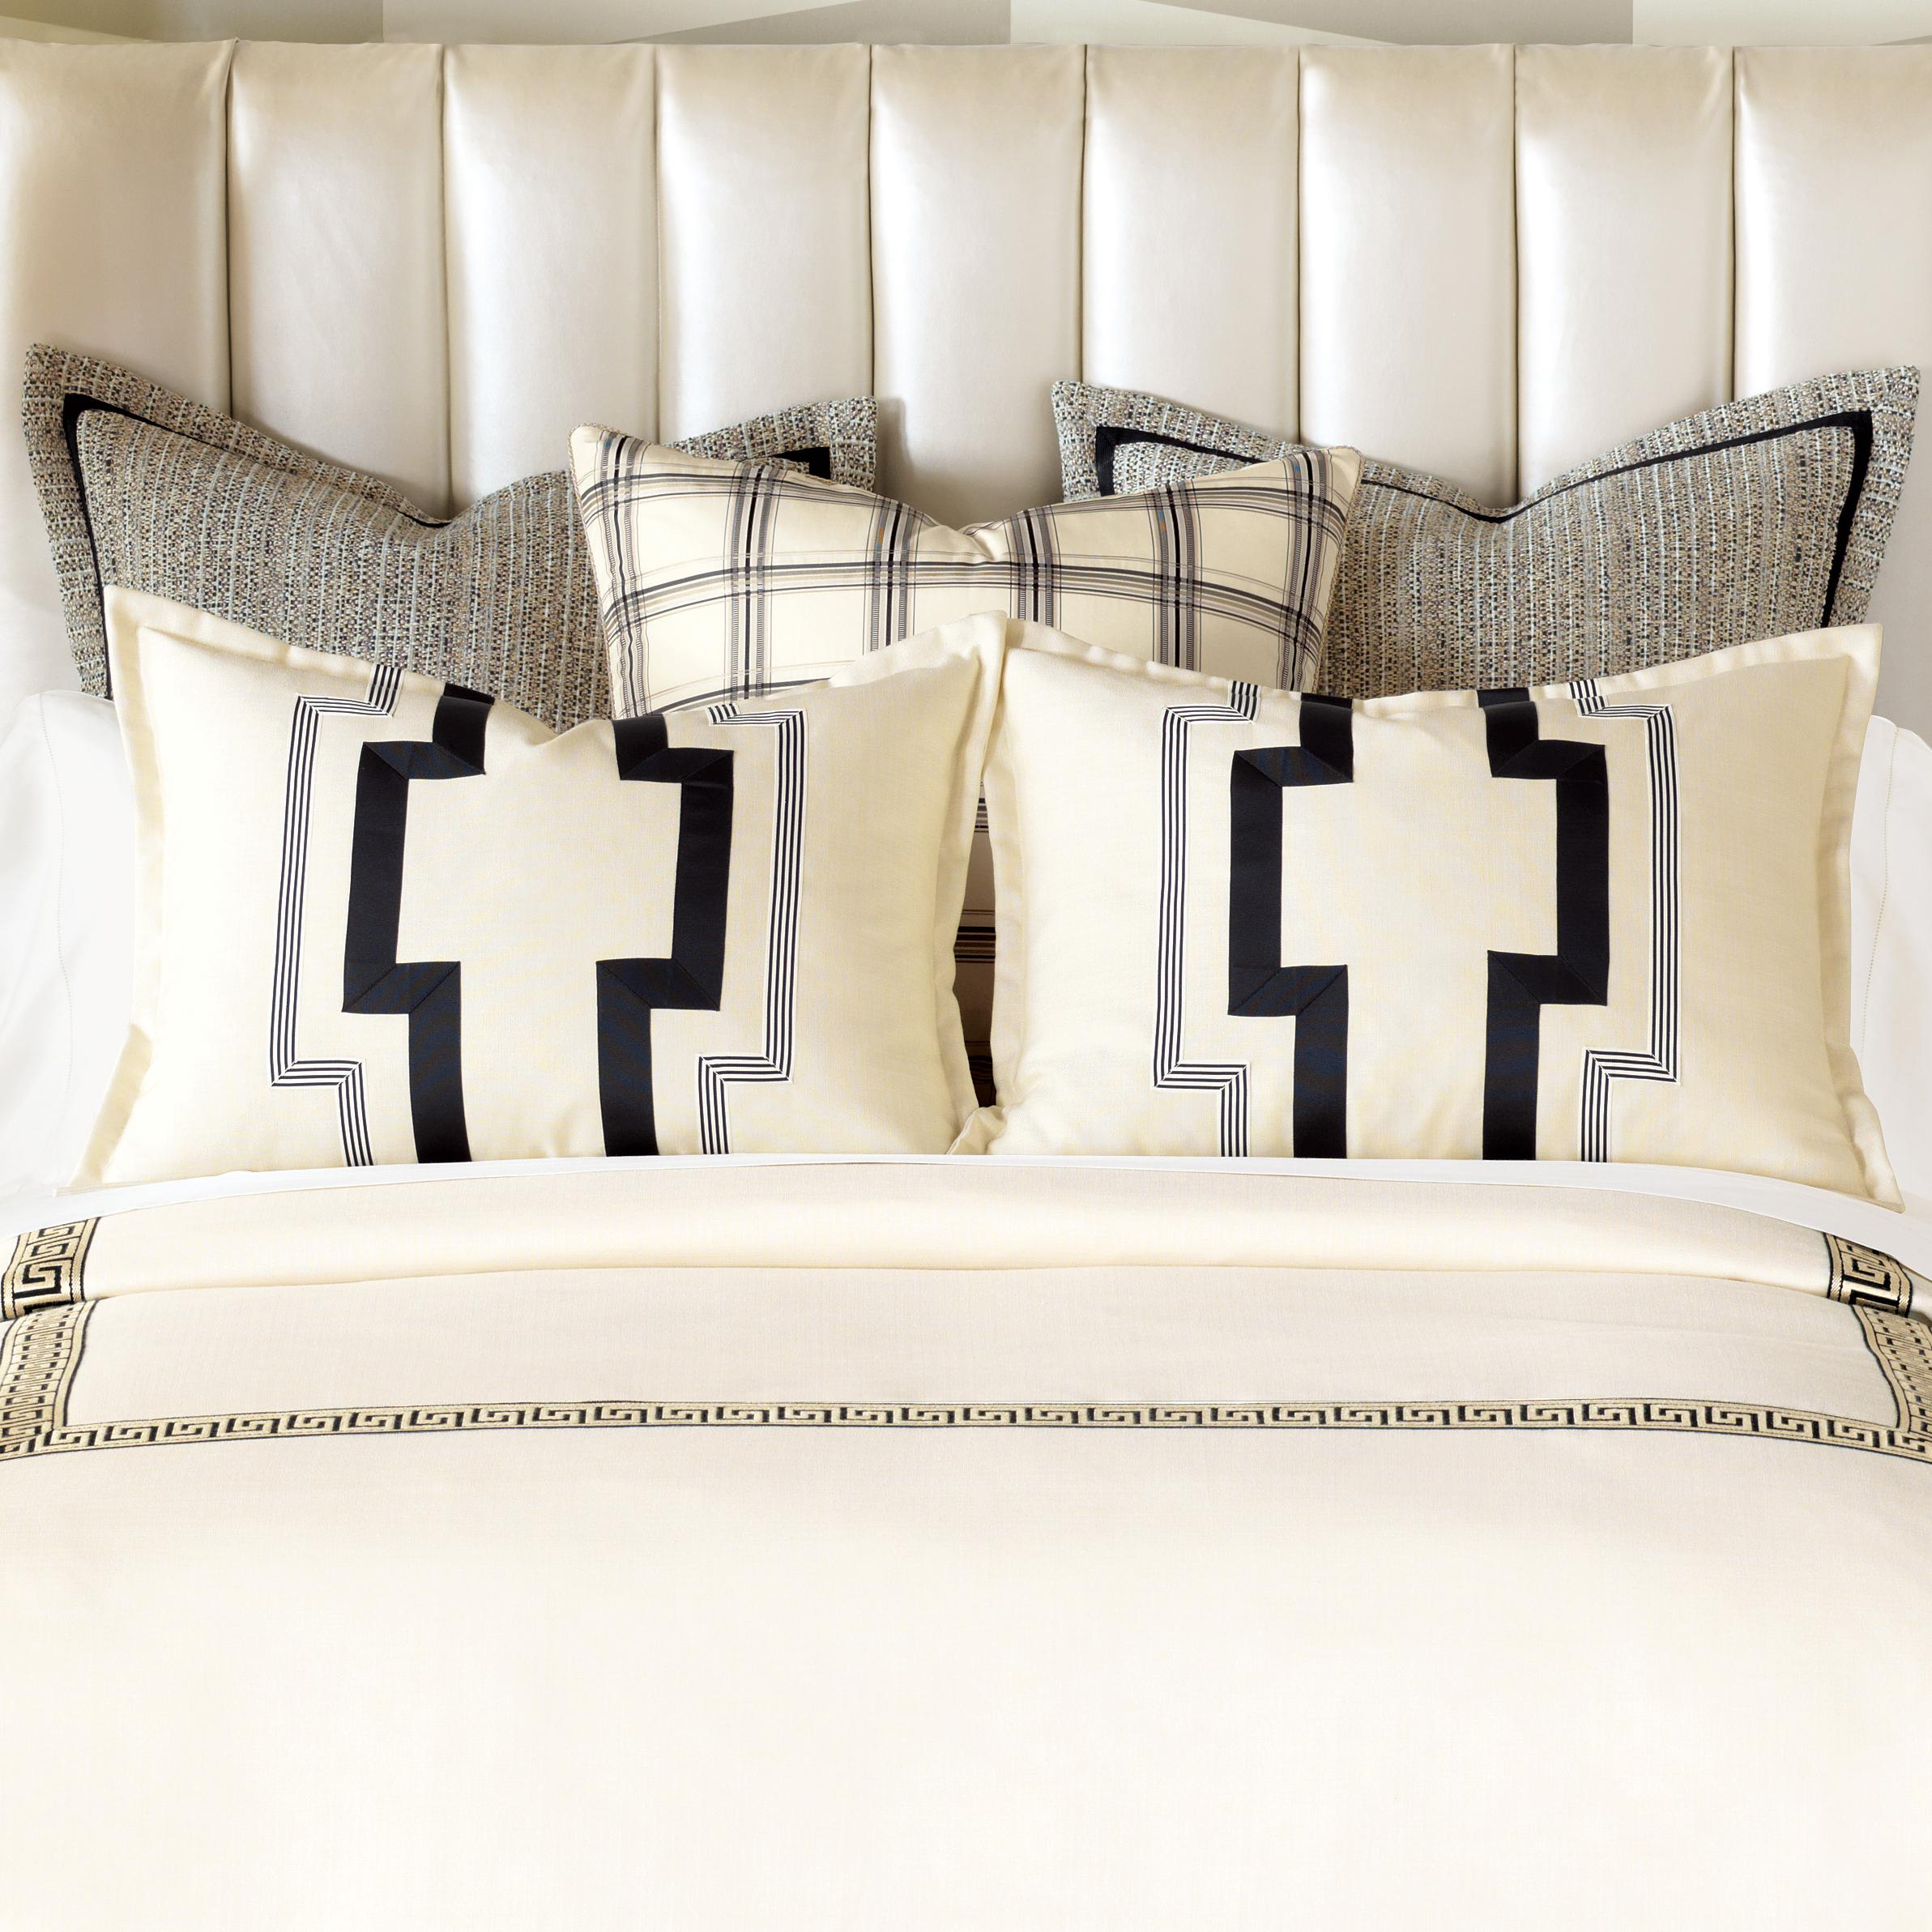 Abernathy Standard Sham by Eastern Accents at Michael Alan Furniture & Design